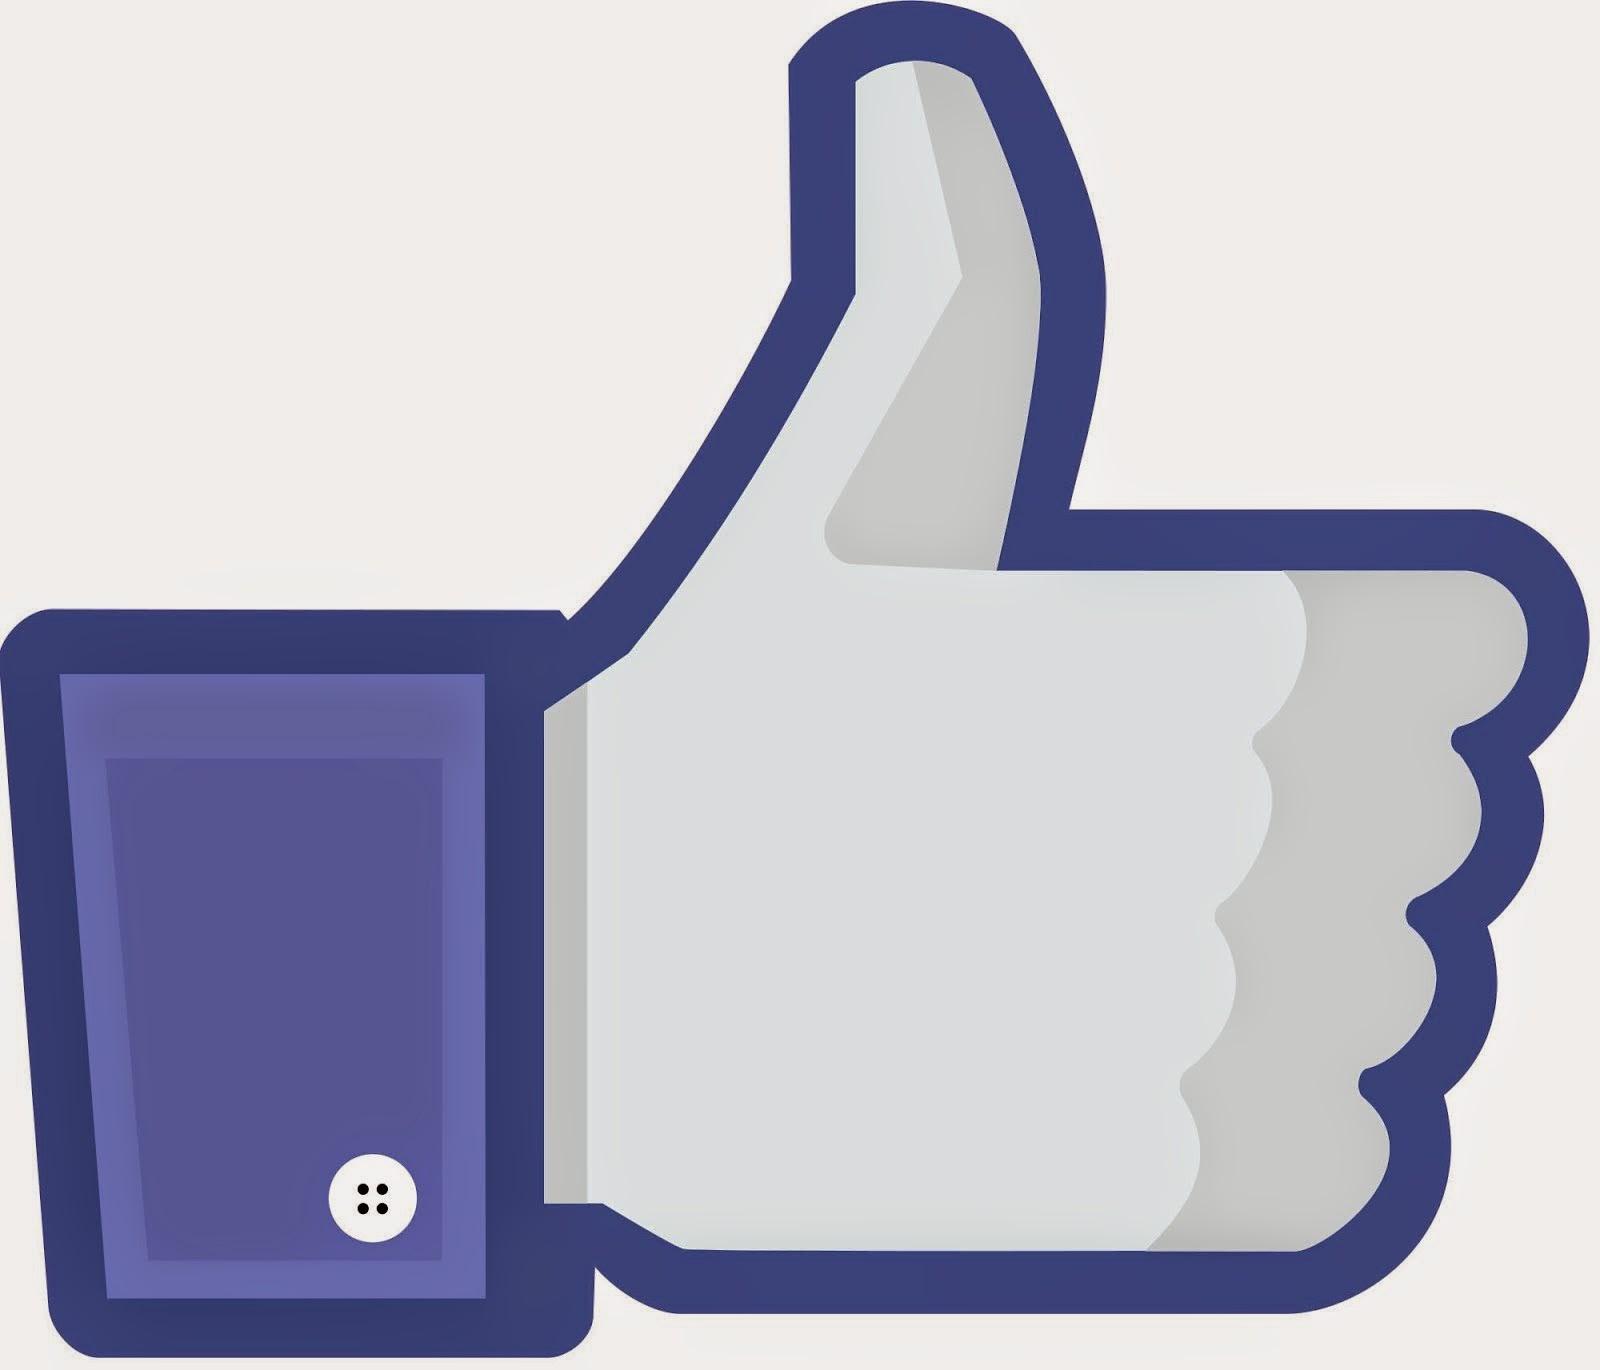 Danos Me Gusta en Facebook!